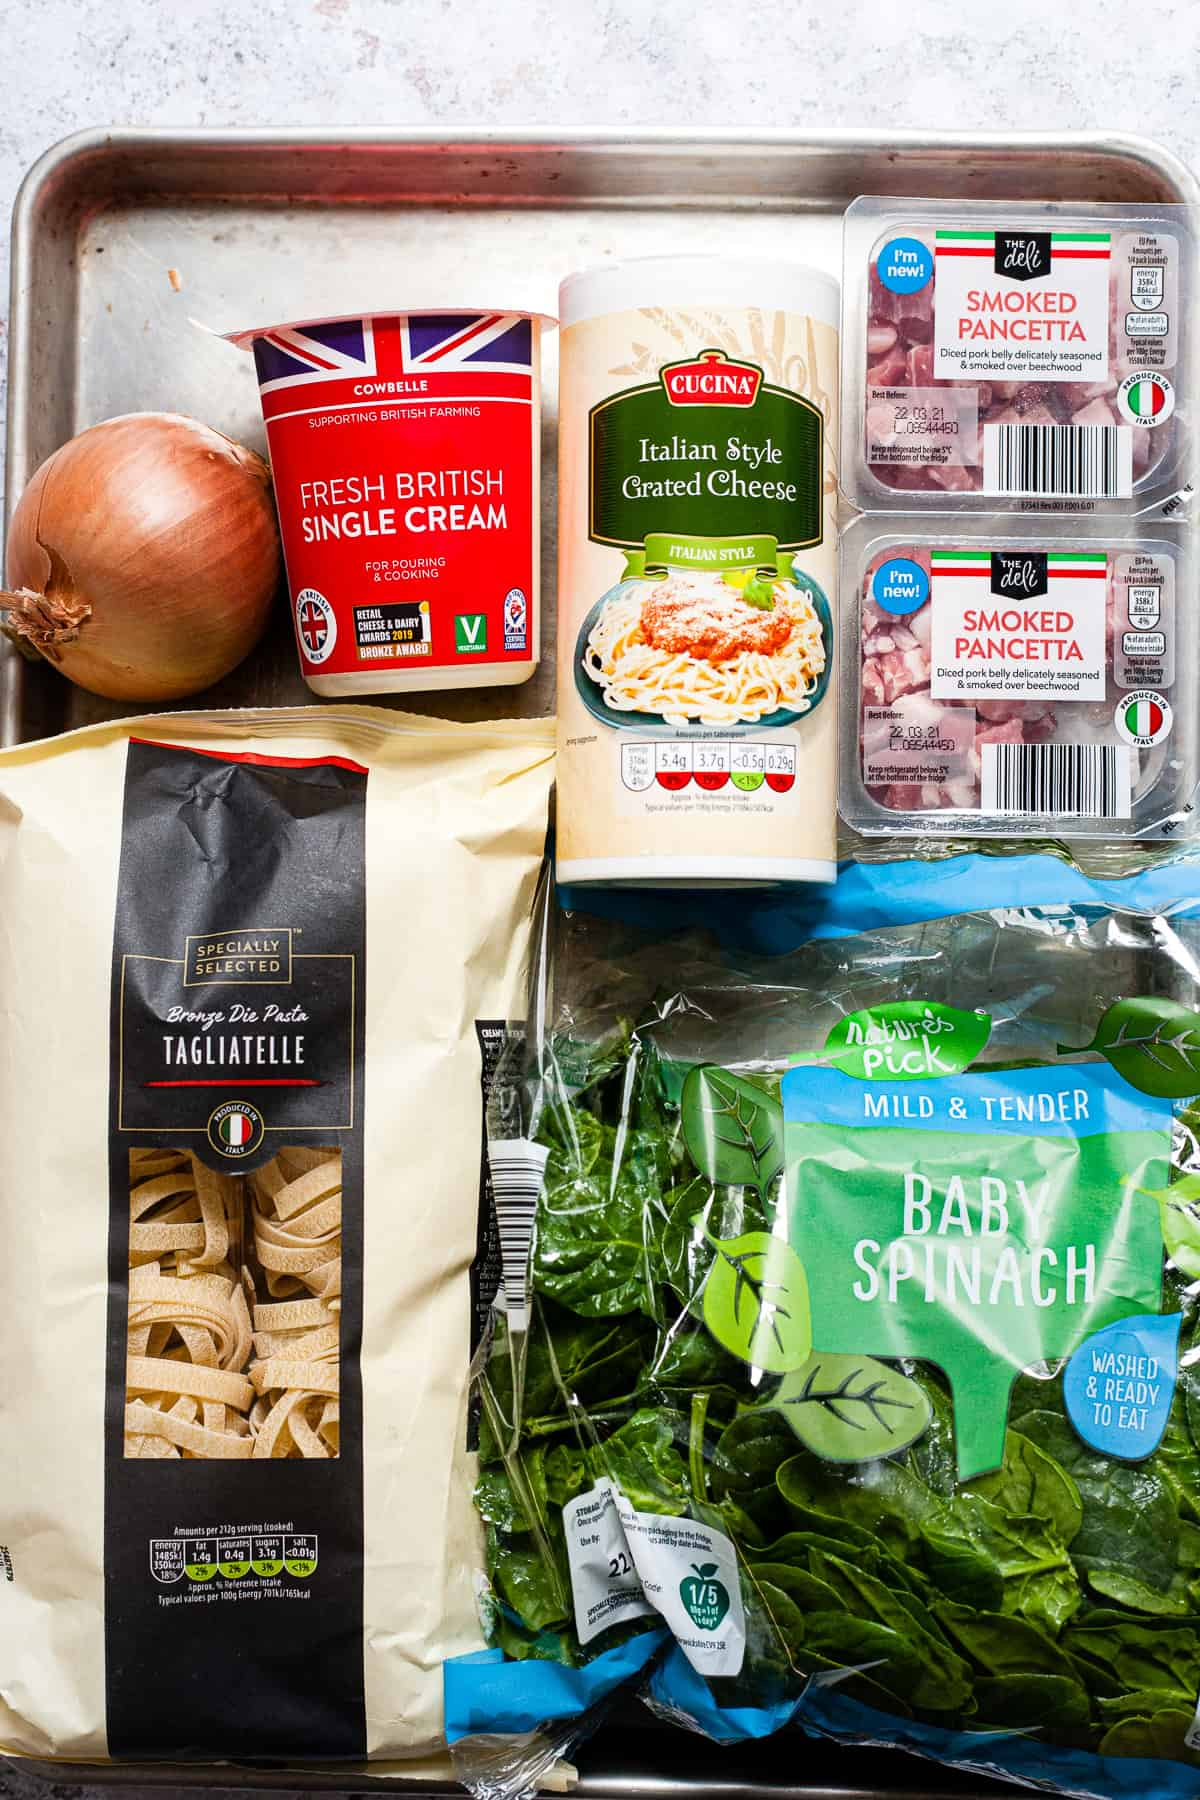 Aldi ingredients for Tuscan roasted tomato pasta sauce